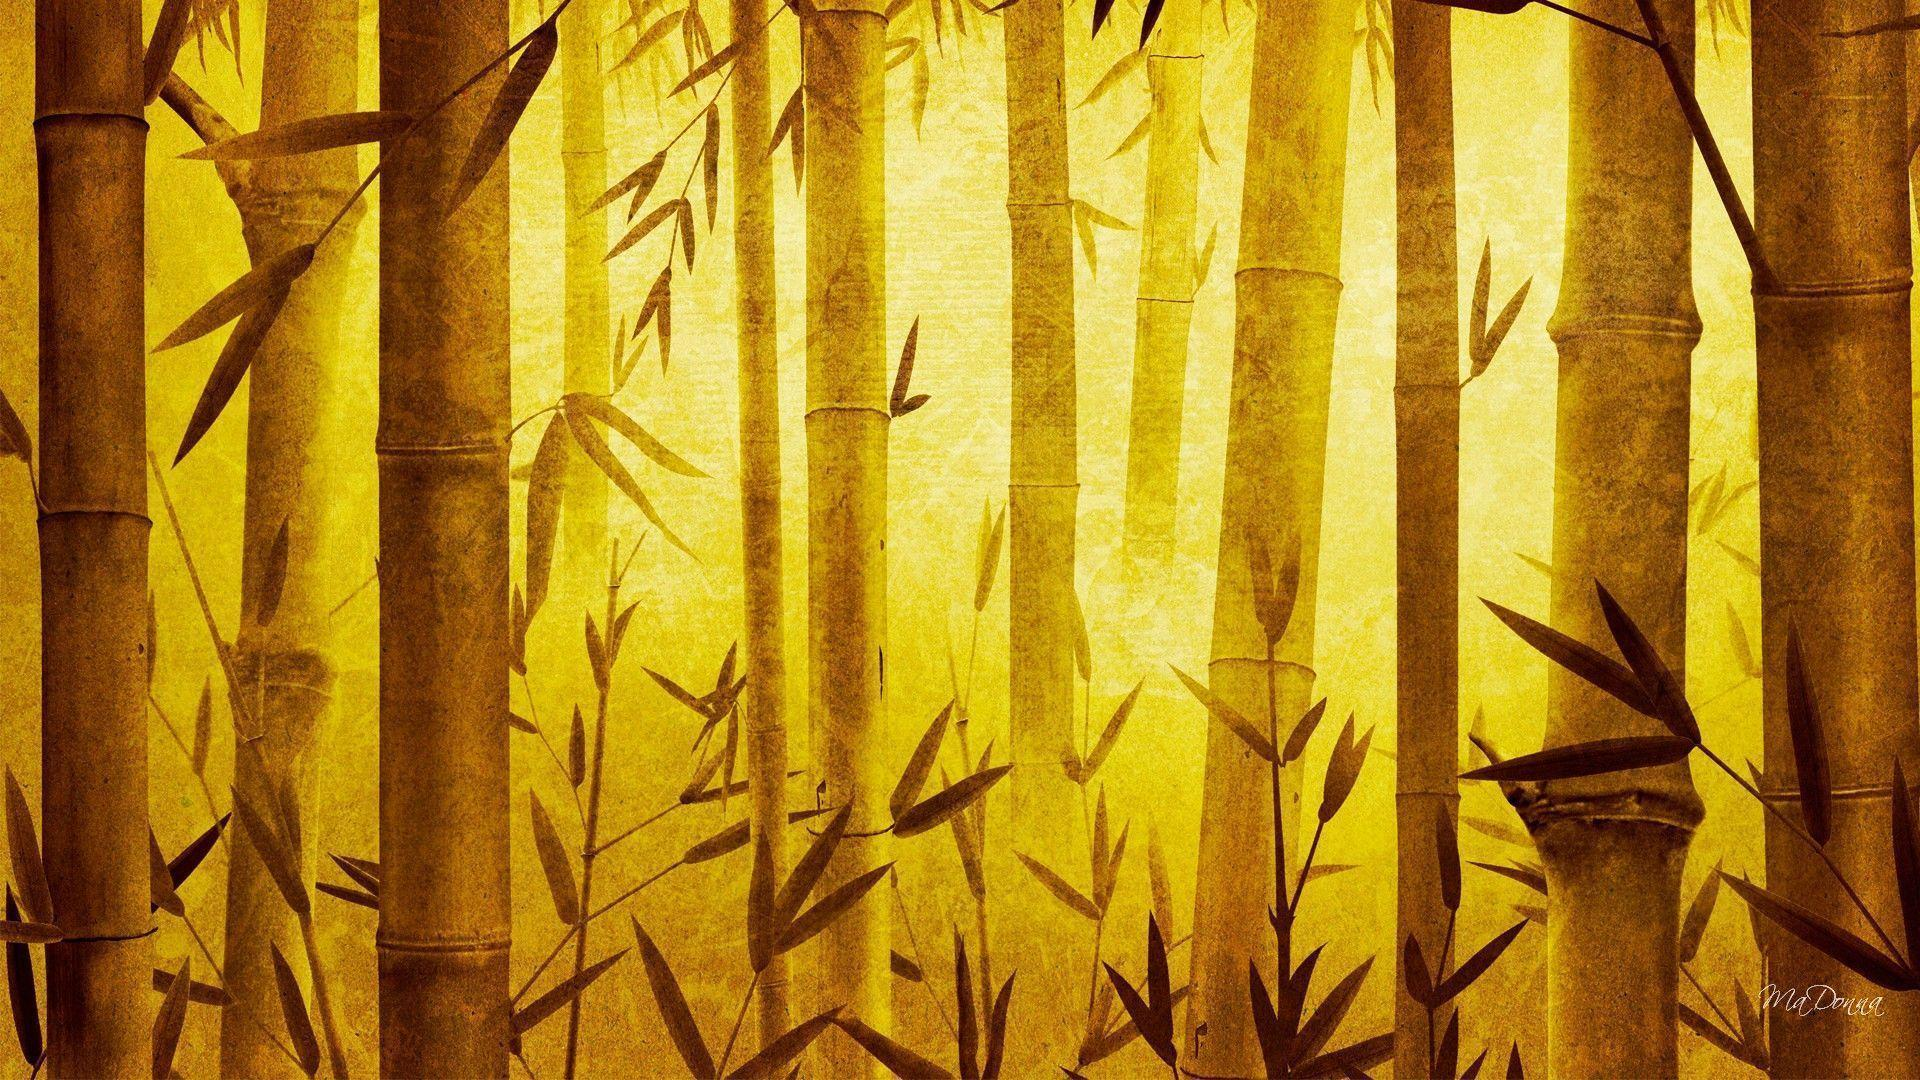 Bamboo Art Design : Bamboo desktop wallpapers wallpaper cave